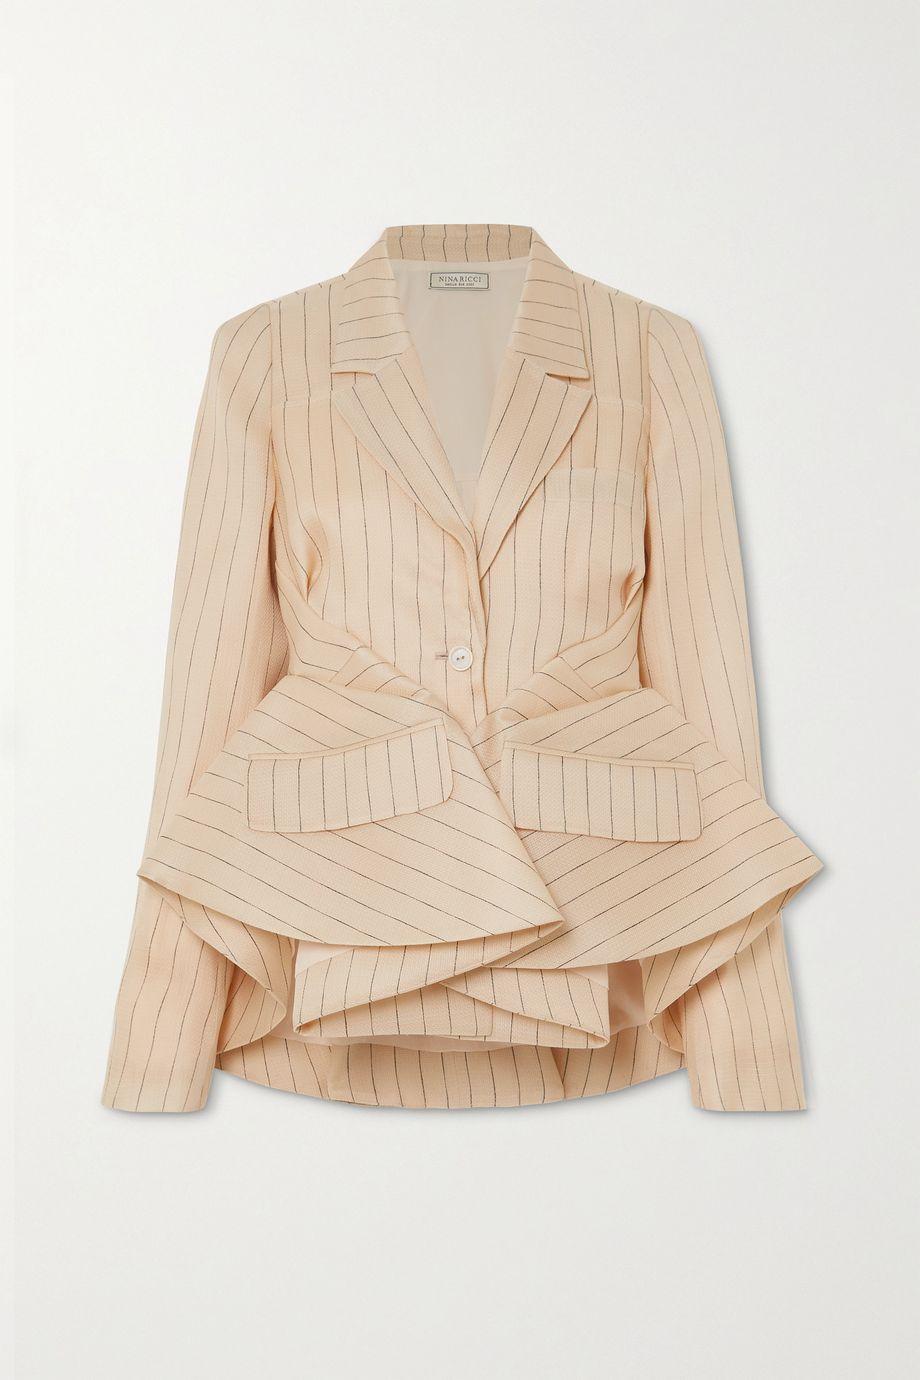 Nina Ricci Gathered pinstriped silk peplum blazer